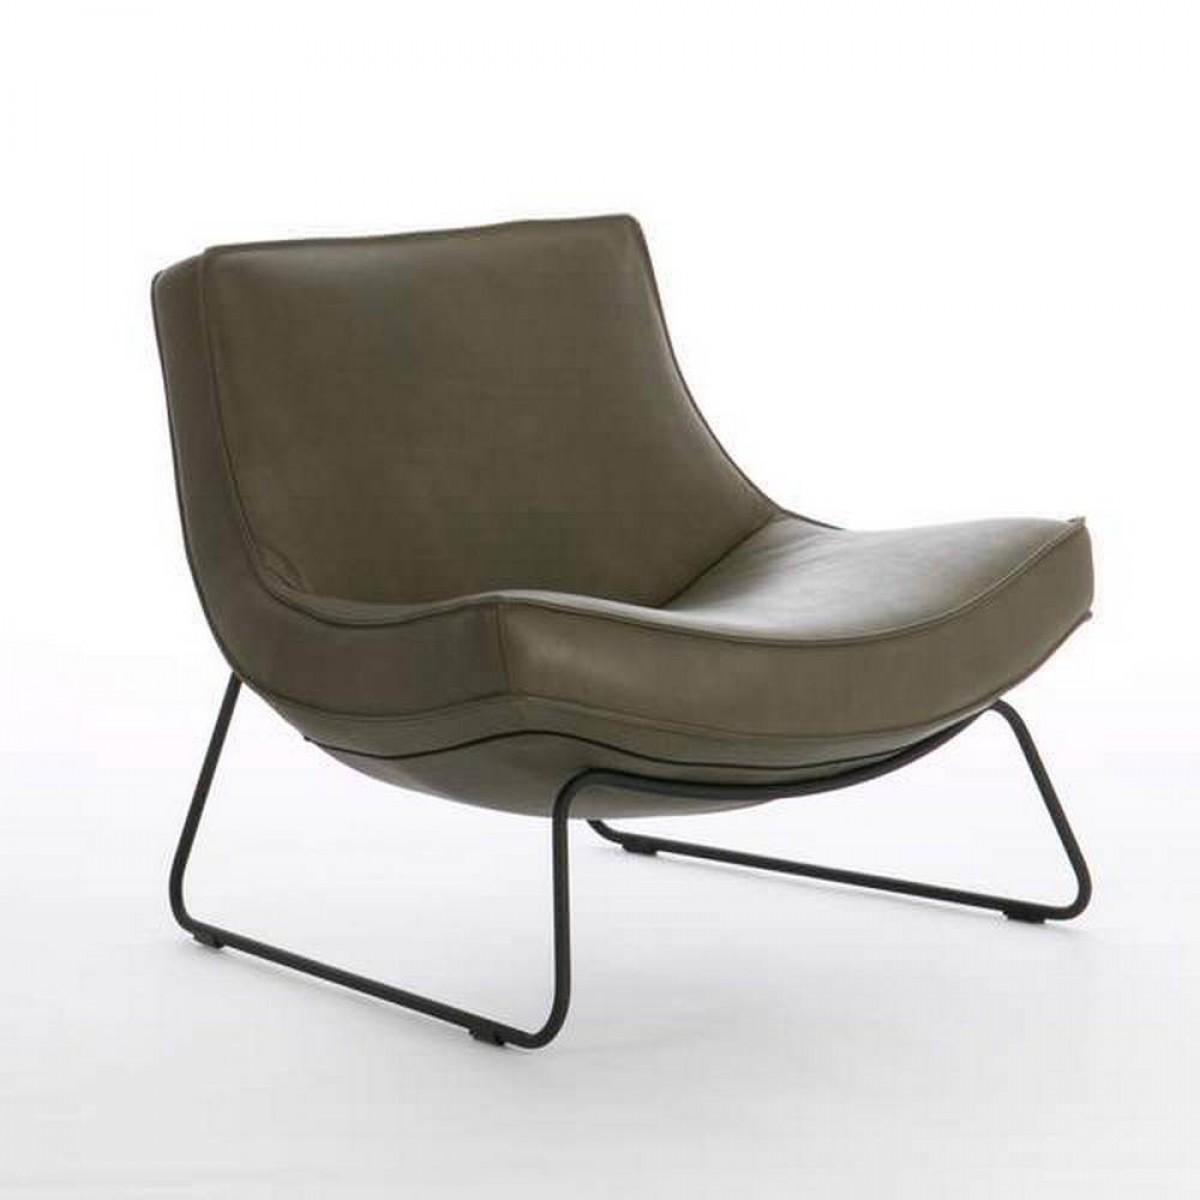 alawa-uwa-fauteuil-slede-frame-matzwart-leder-leer-groen